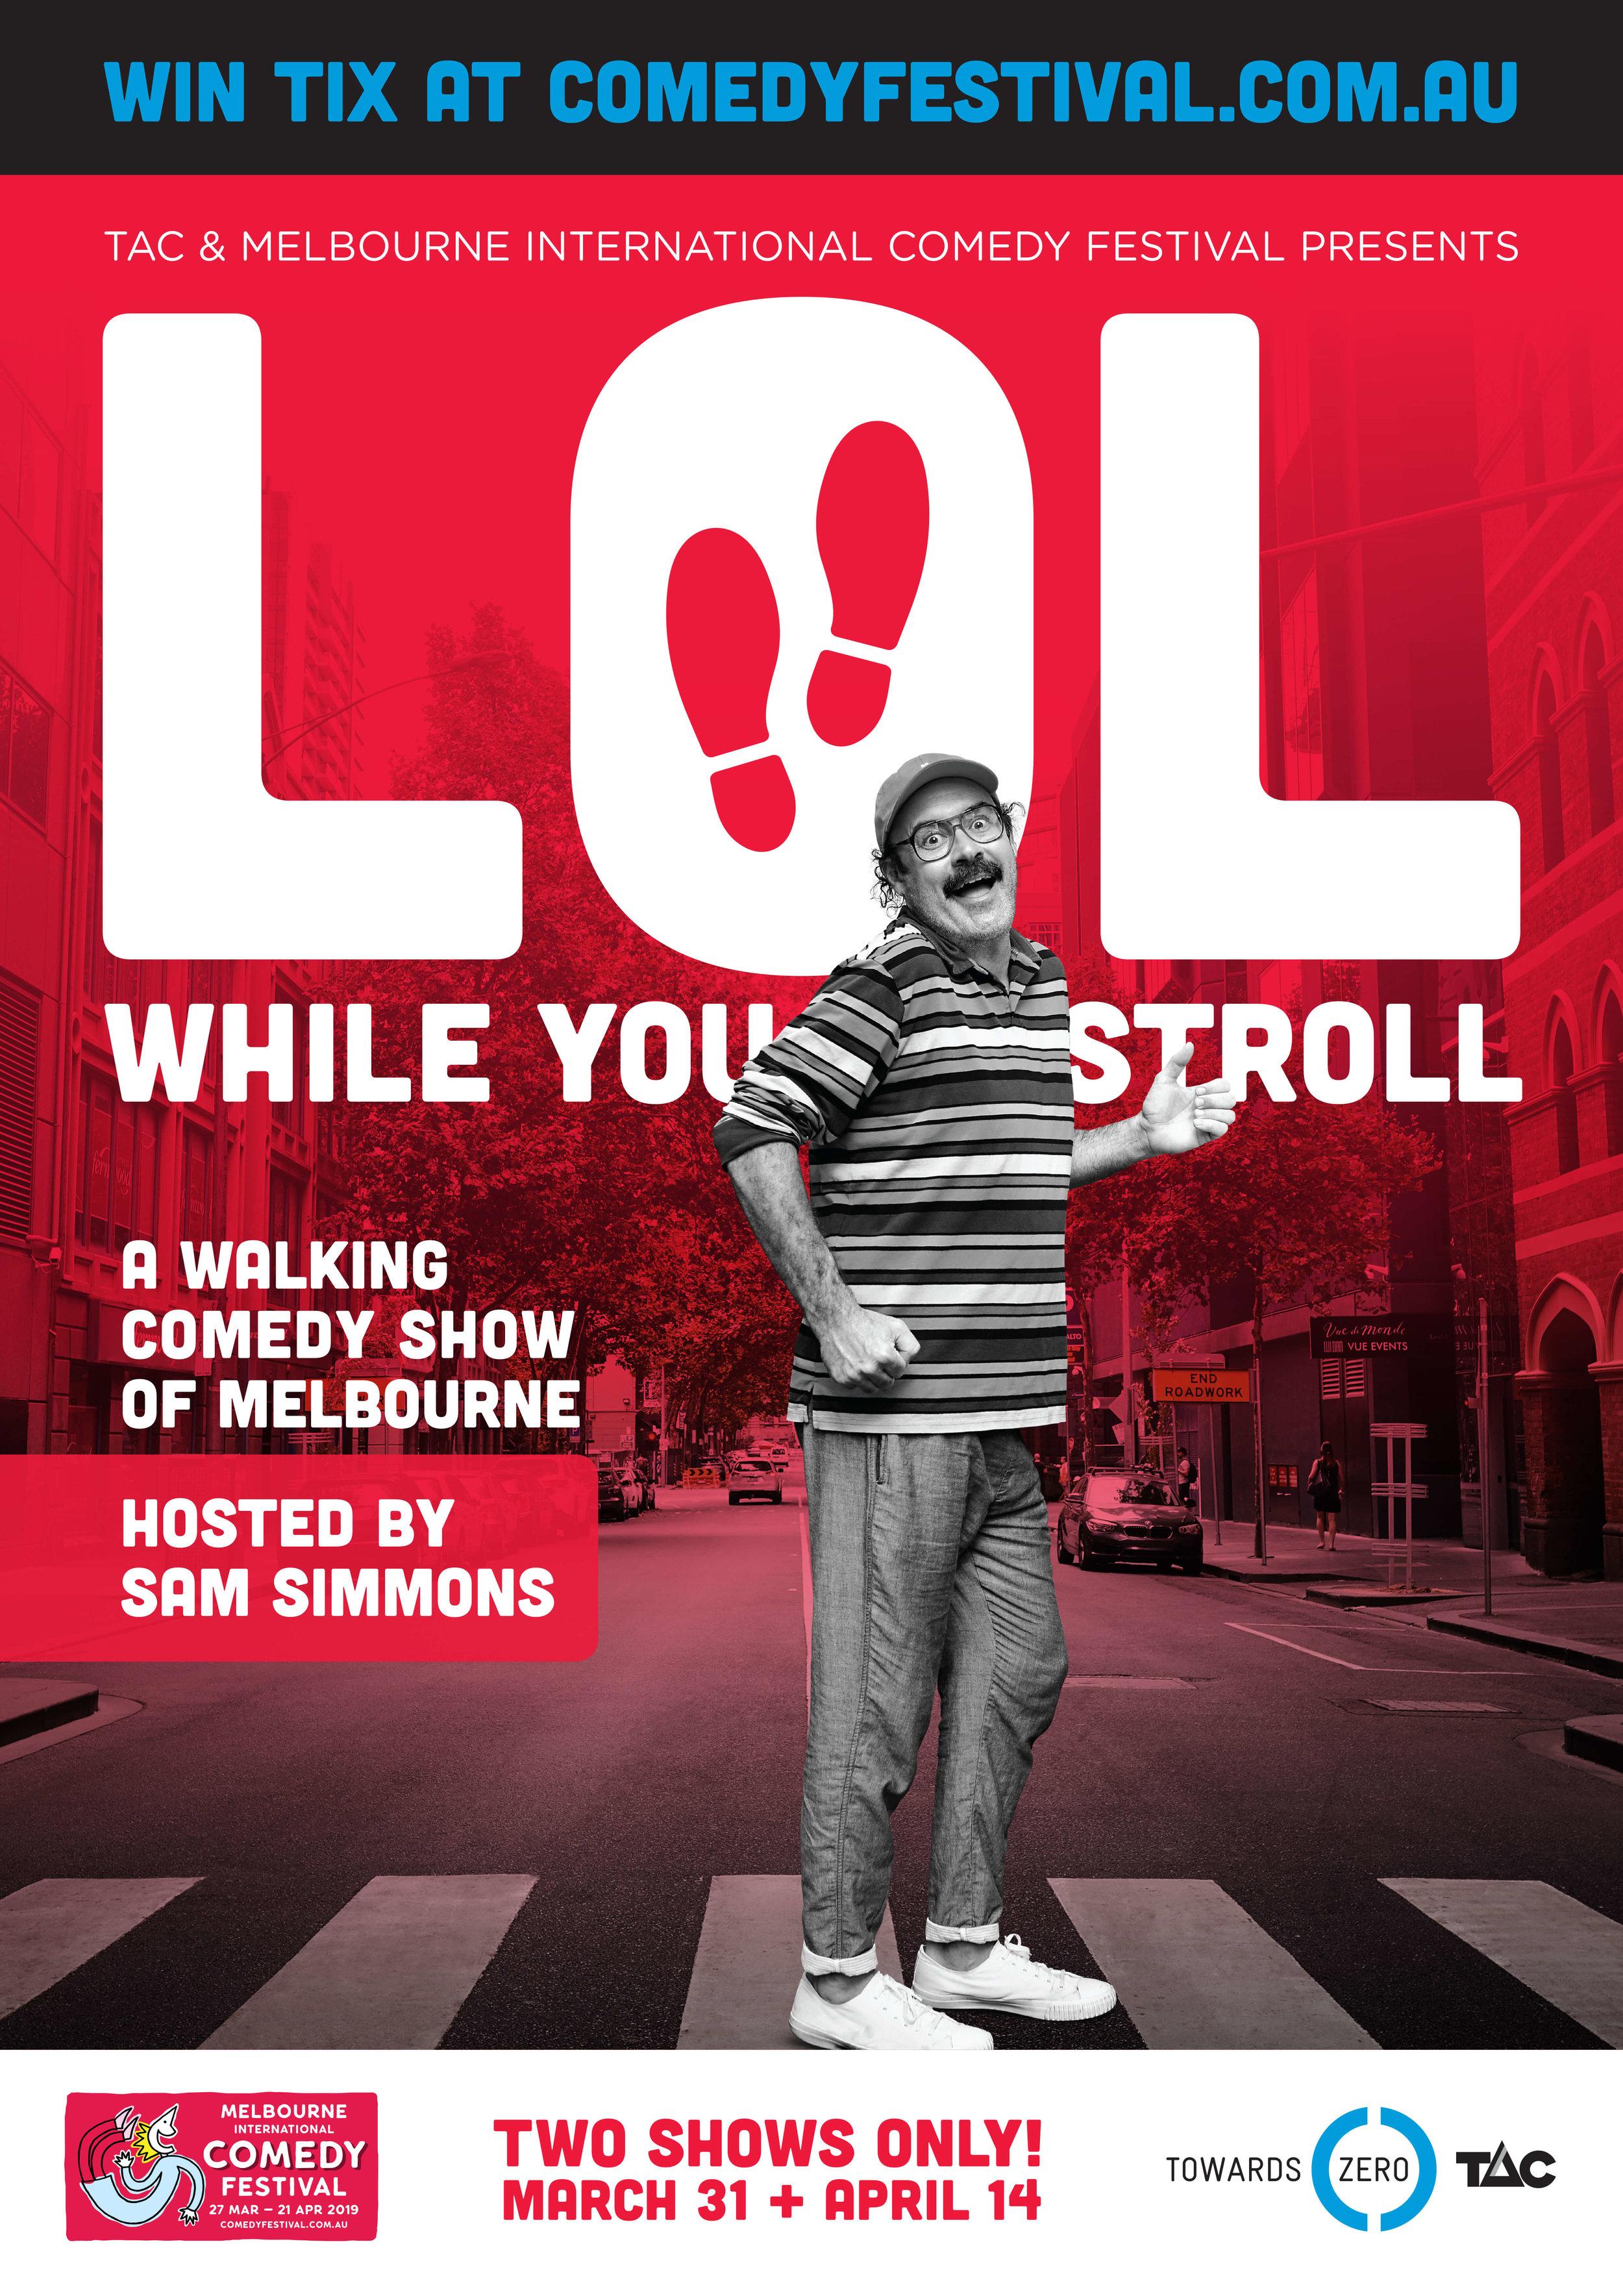 ComedyPoster.jpg